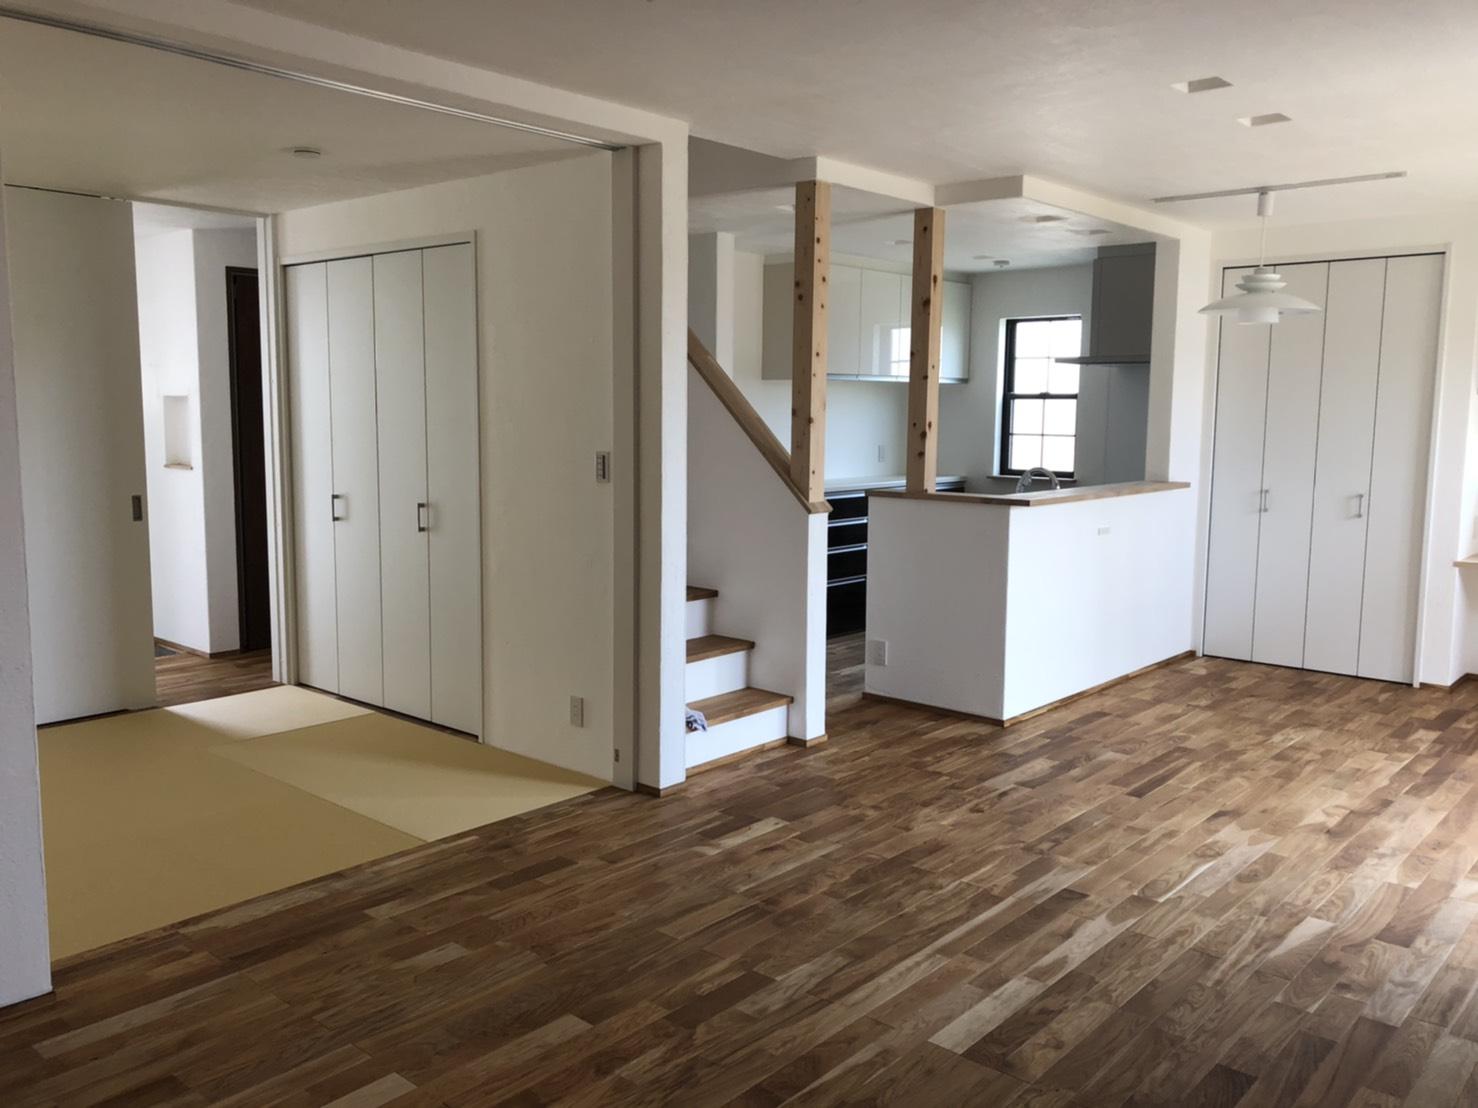 自然素材 無添加住宅 無垢材 暖かい家